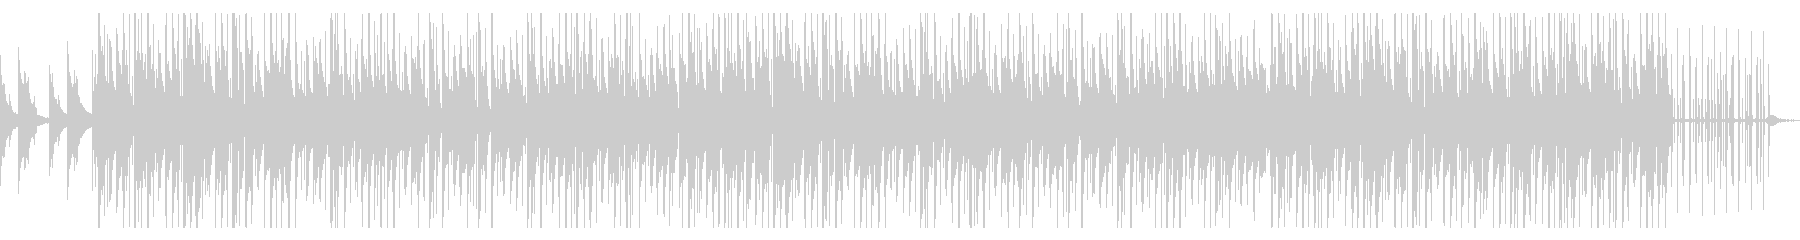 CM・映像等に おしゃれなヒップホップの未再生の波形